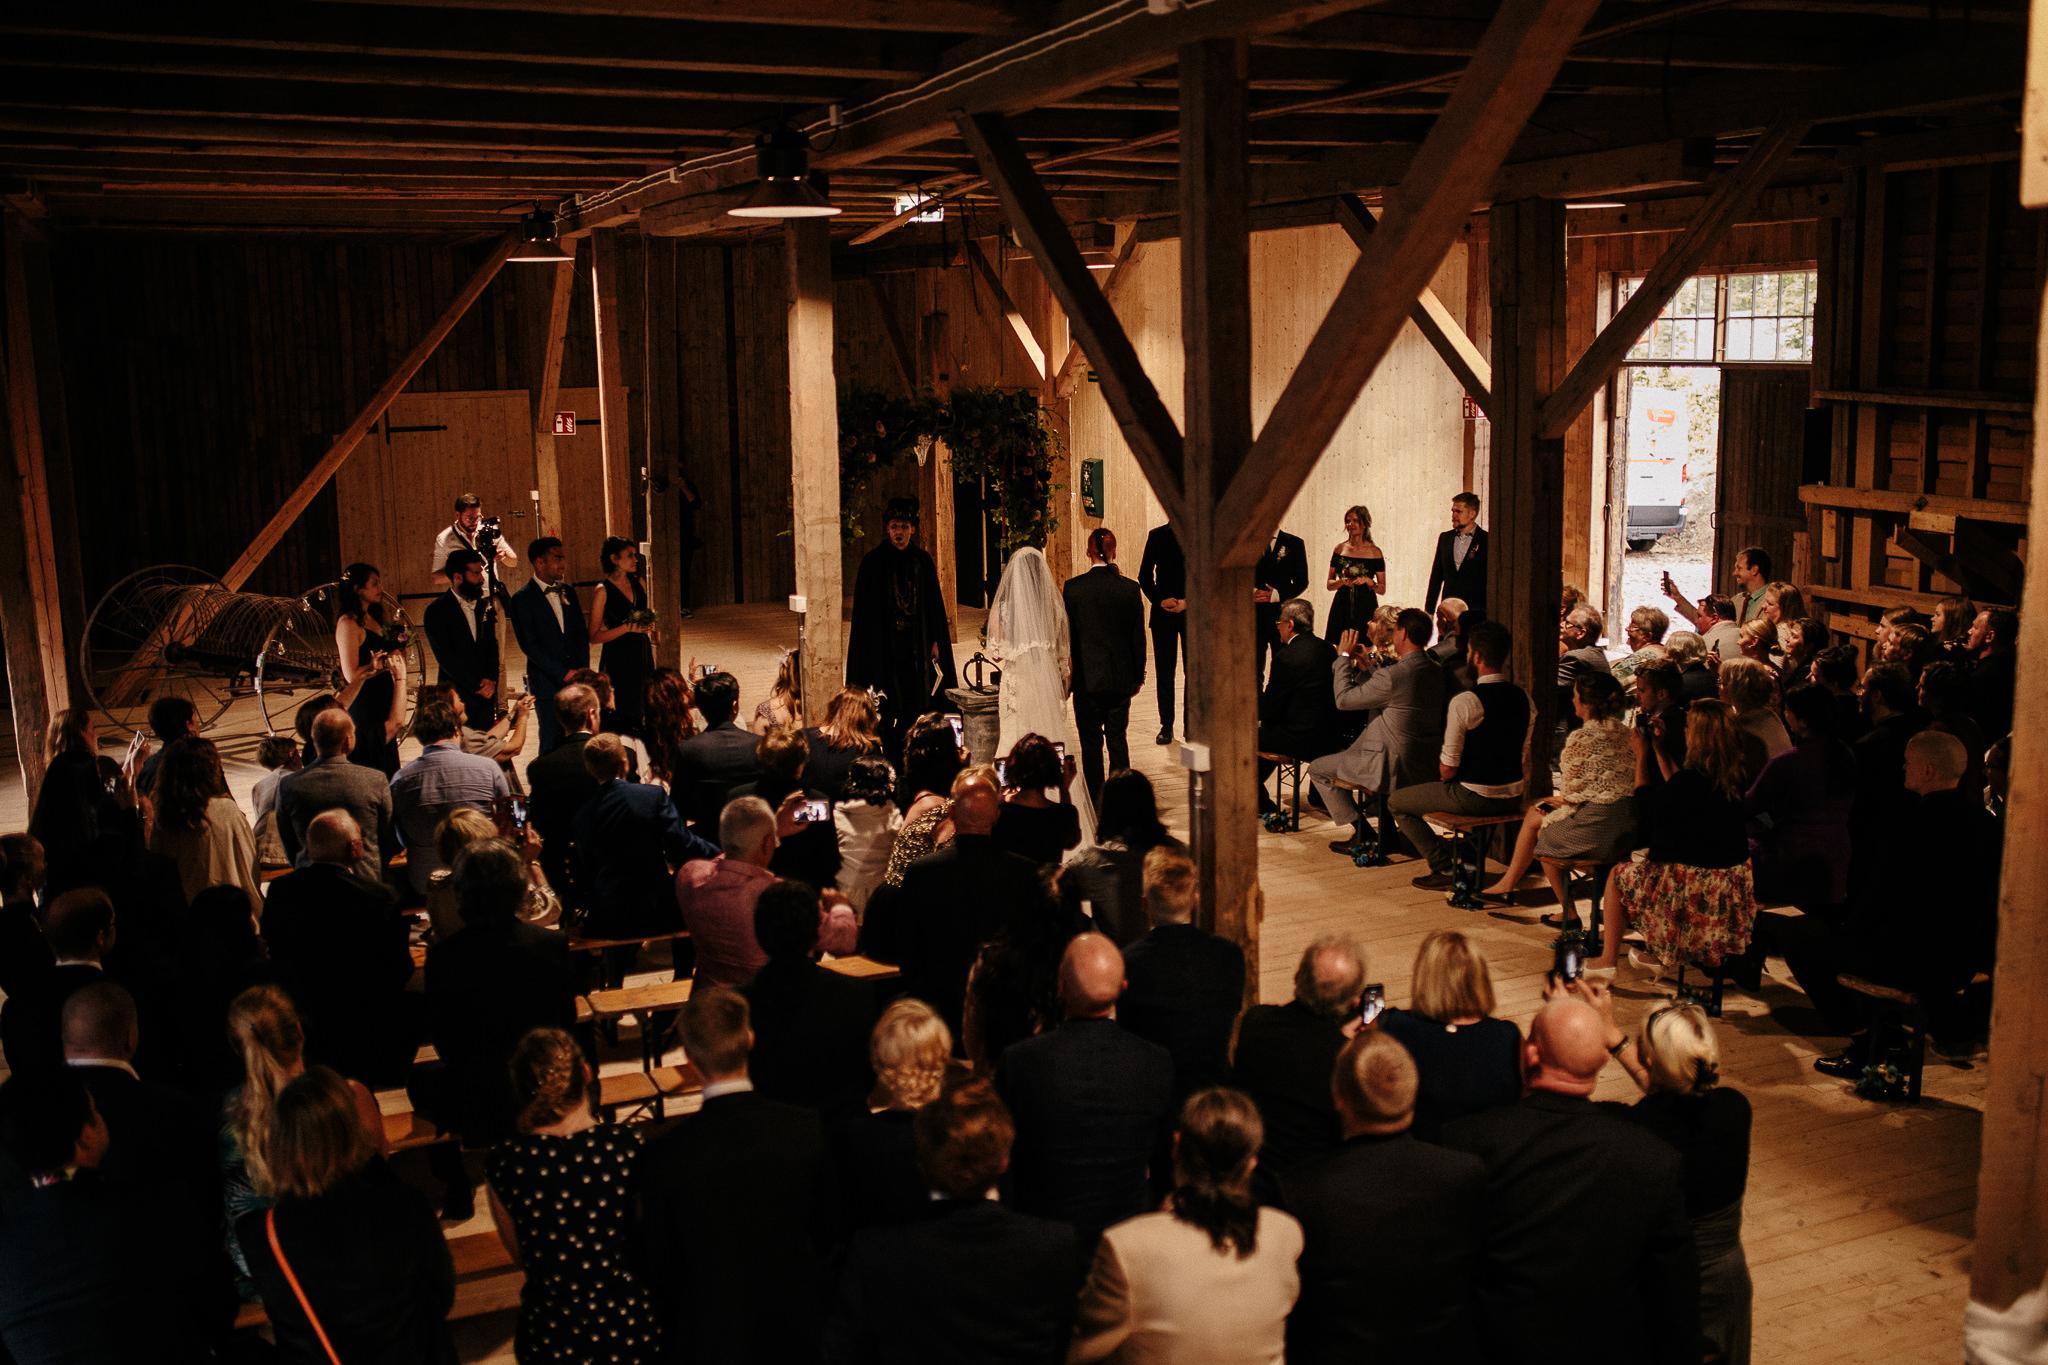 Ceren & Jani - Finland Wedding Photographer - Weddings by Qay - Wedding Photographer (109 of 166).jpg